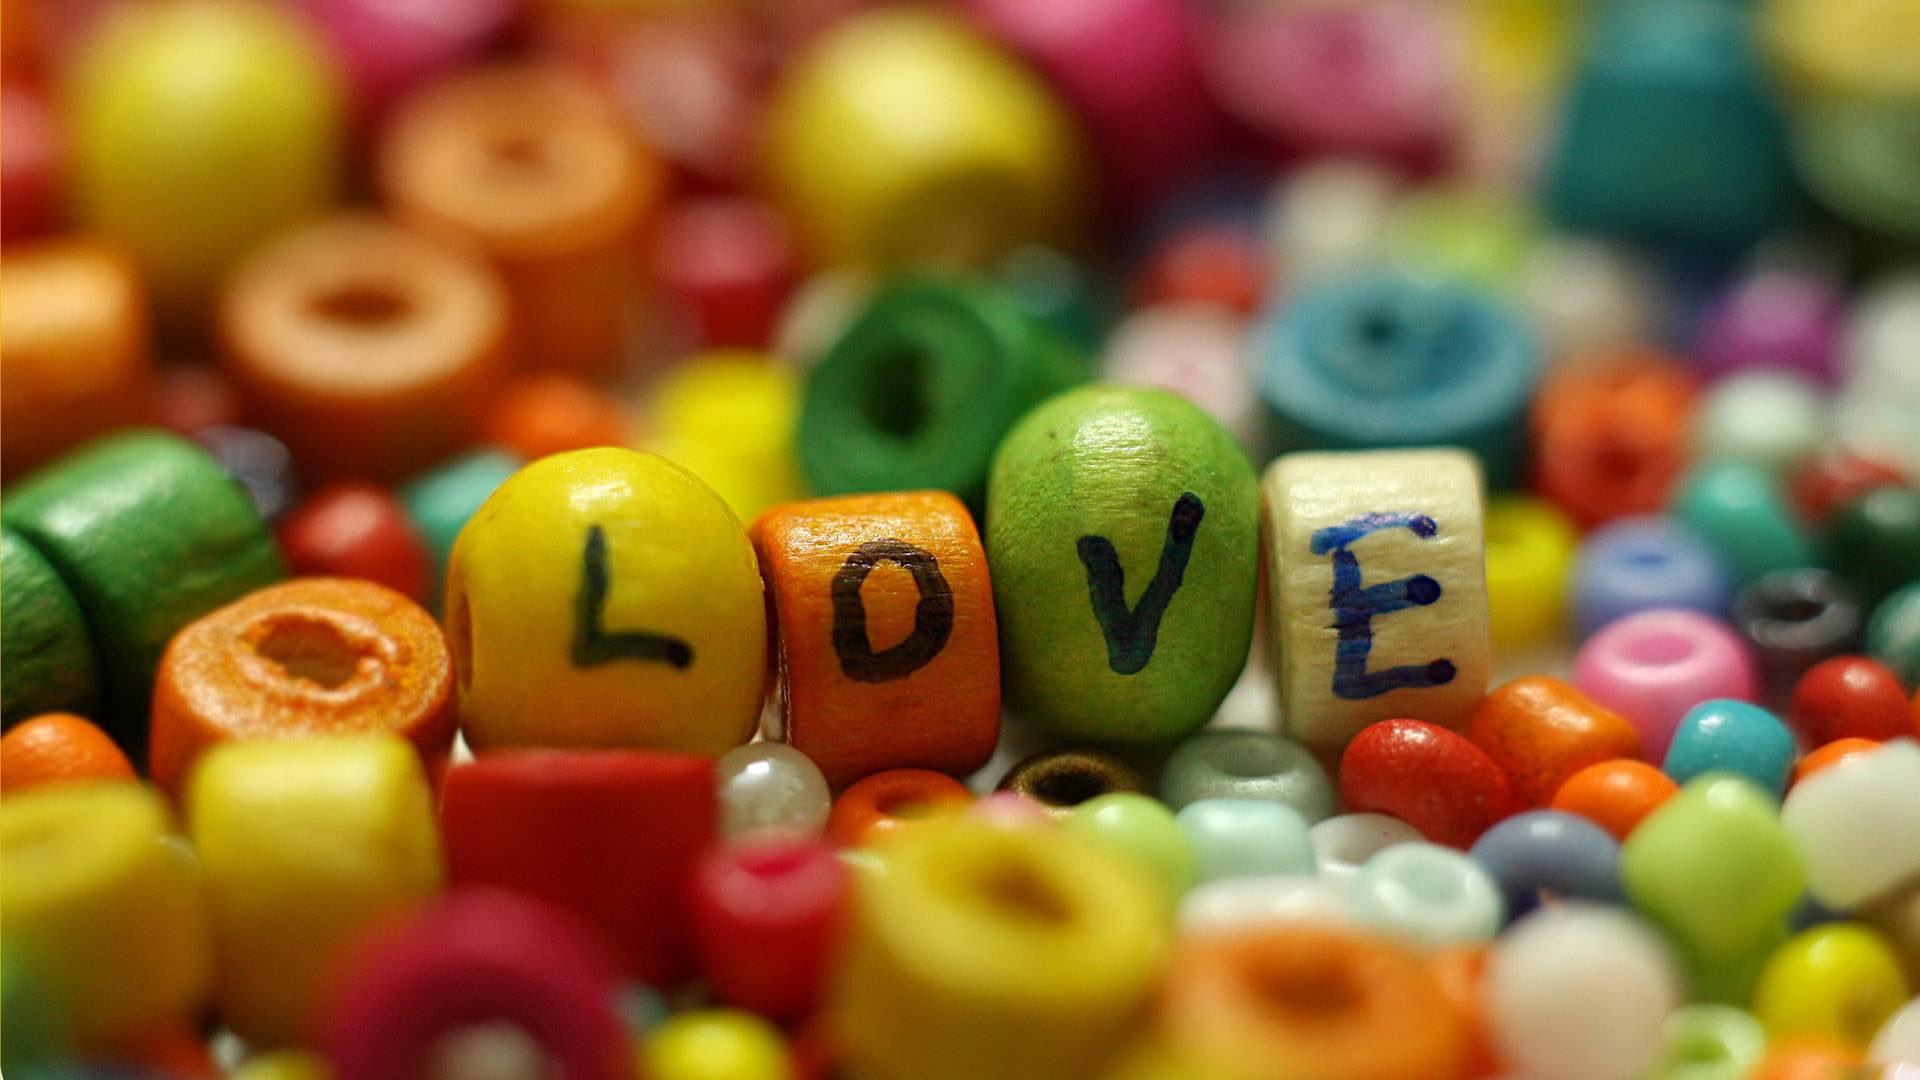 Wallpaper Manik Manik Warna Warni Tulisan Cinta